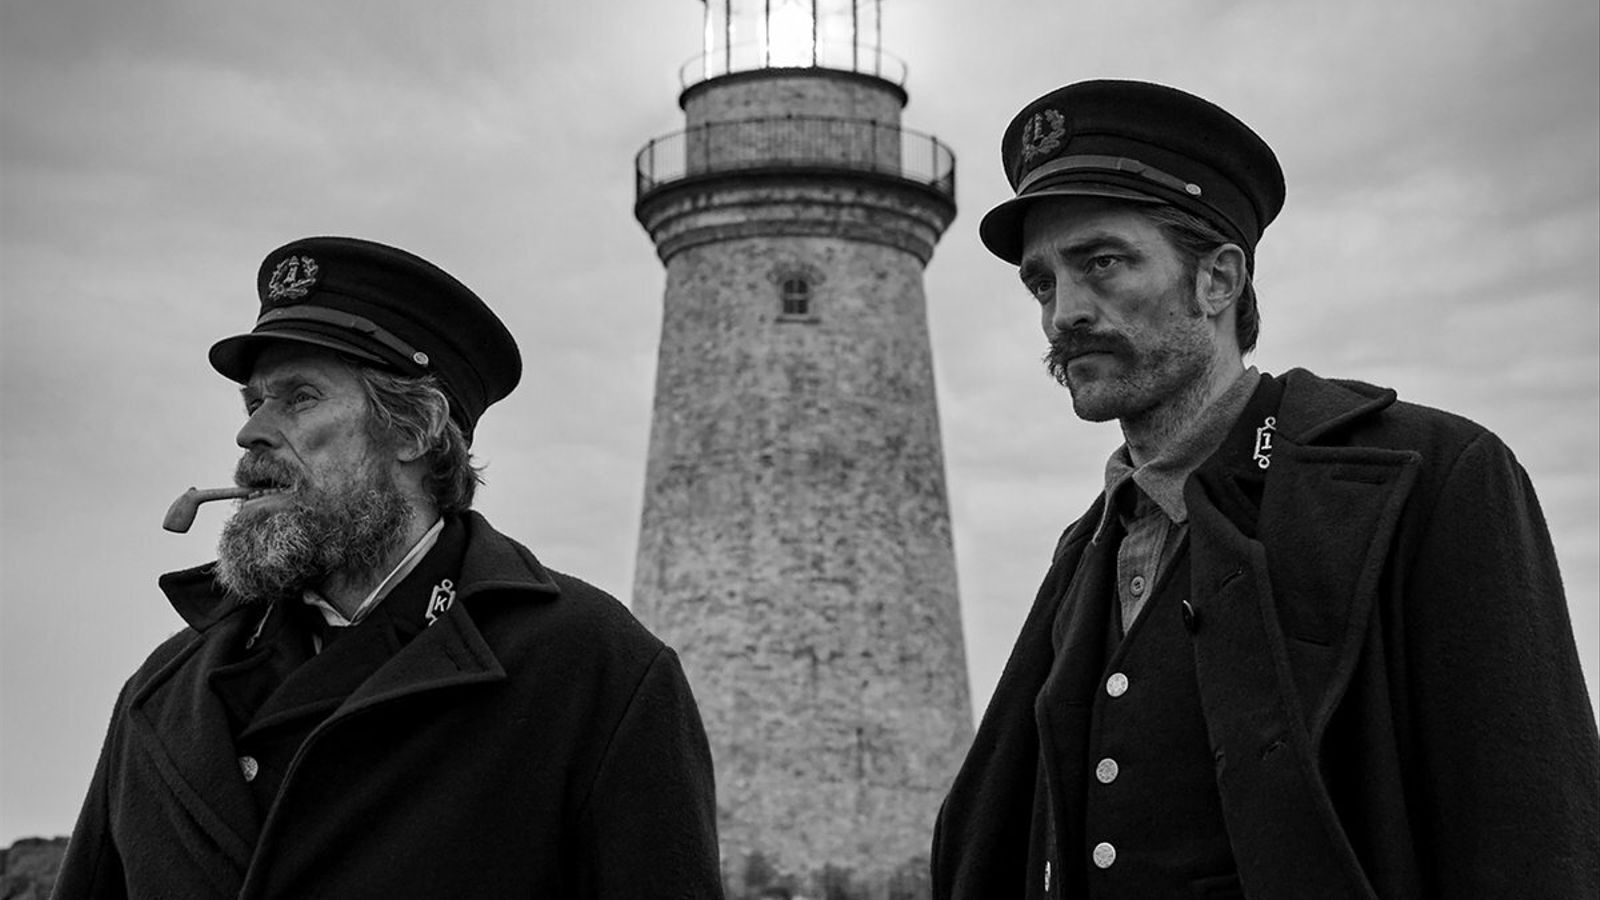 Robert Pattinson i Willem Dafoe, un duel memorable a la imponent 'The lighhouse'